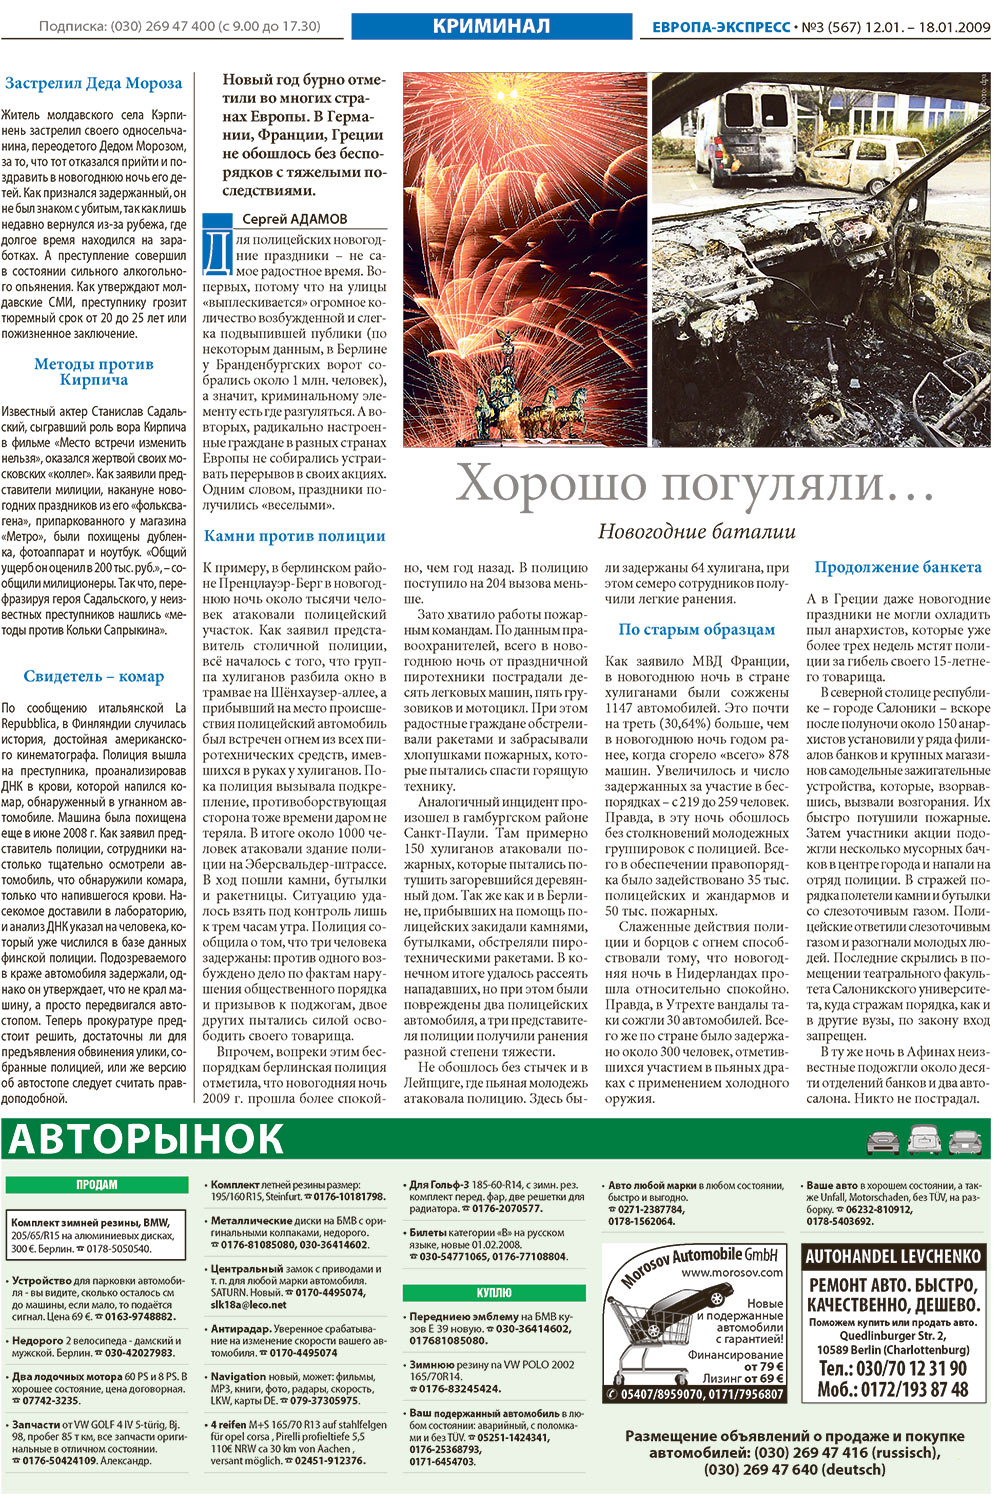 Европа экспресс (газета). 2009 год, номер 1, стр. 21